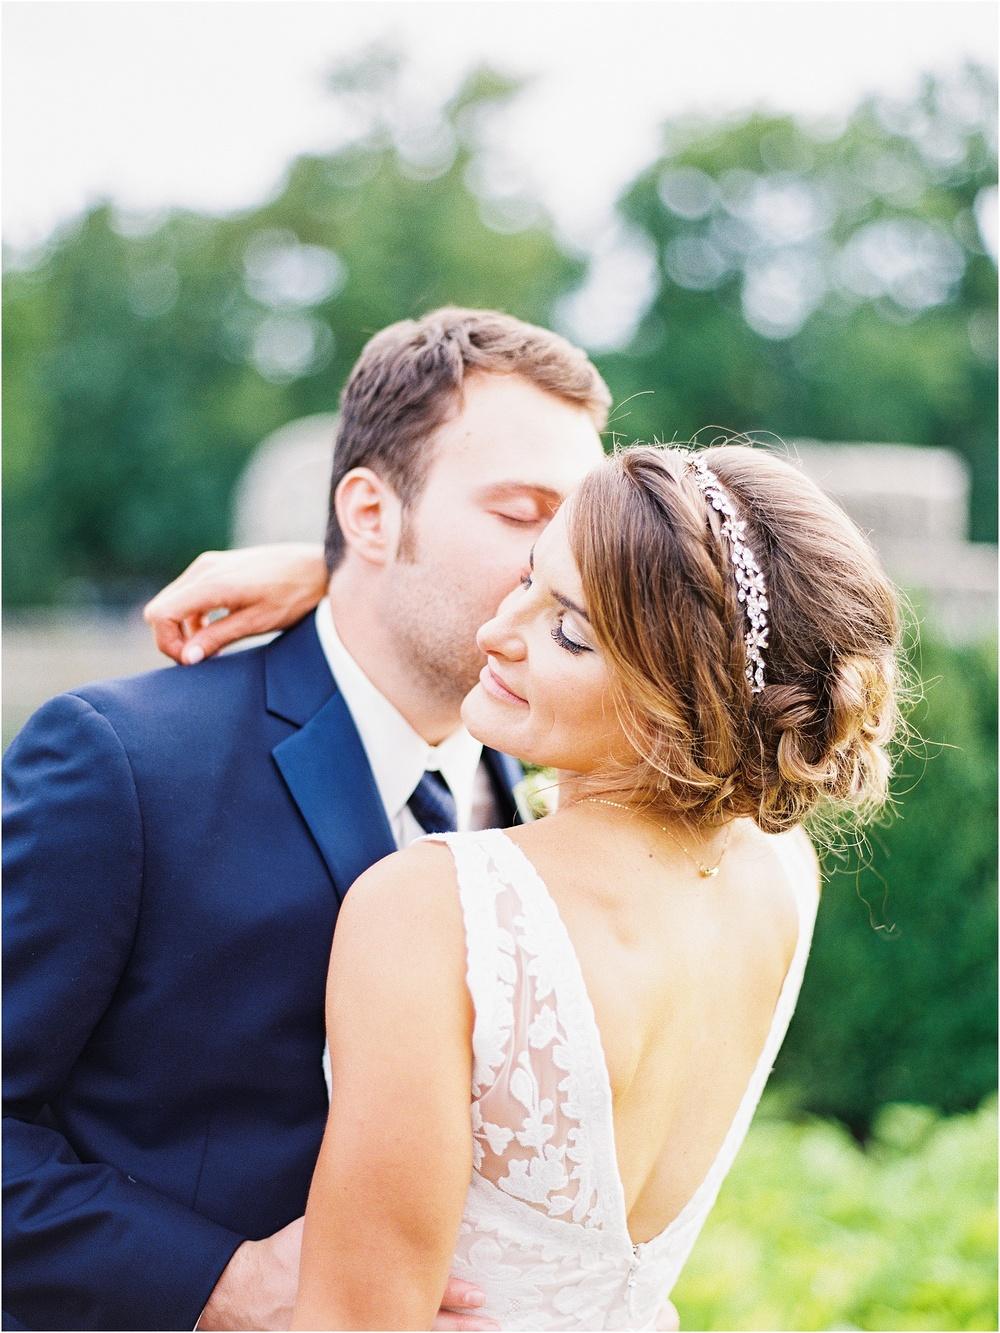 Intimate St Louis MO Wedding by Jordan Brittley Photography (www.jordanbrittley.com)